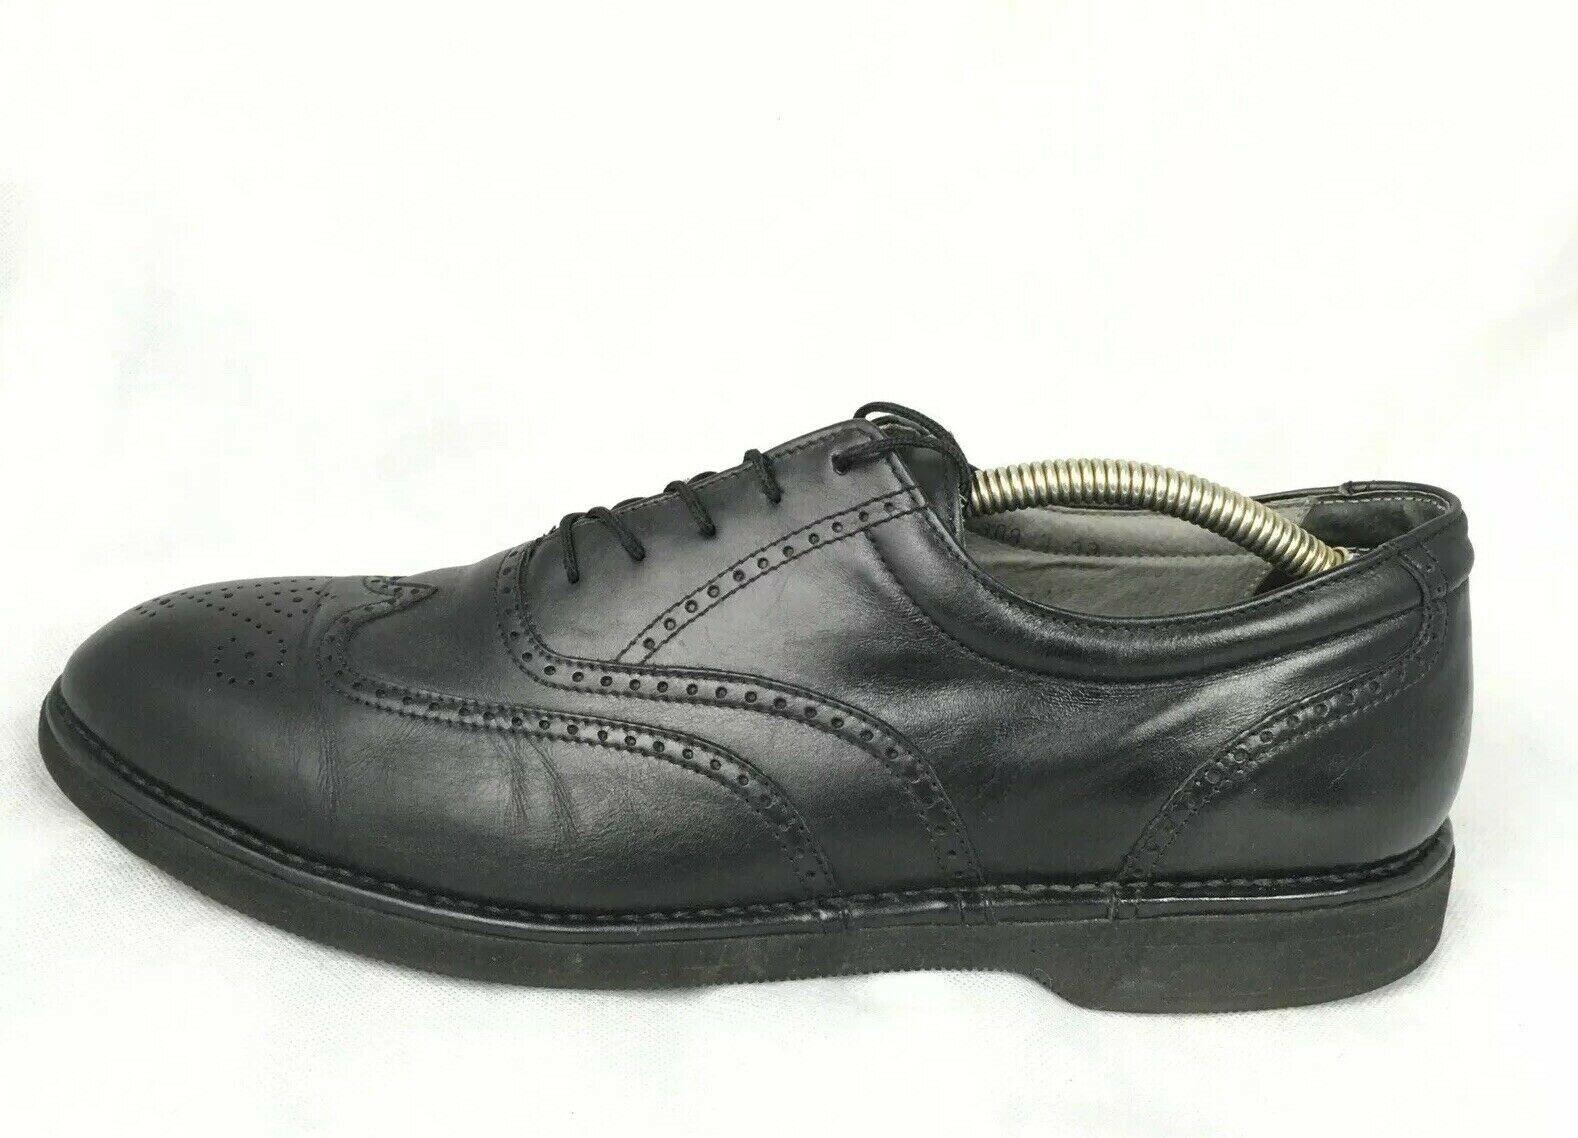 Rockport DresSports M3678 Black Leather Vibram Brogue Wingtip Shoes Sz 13 N